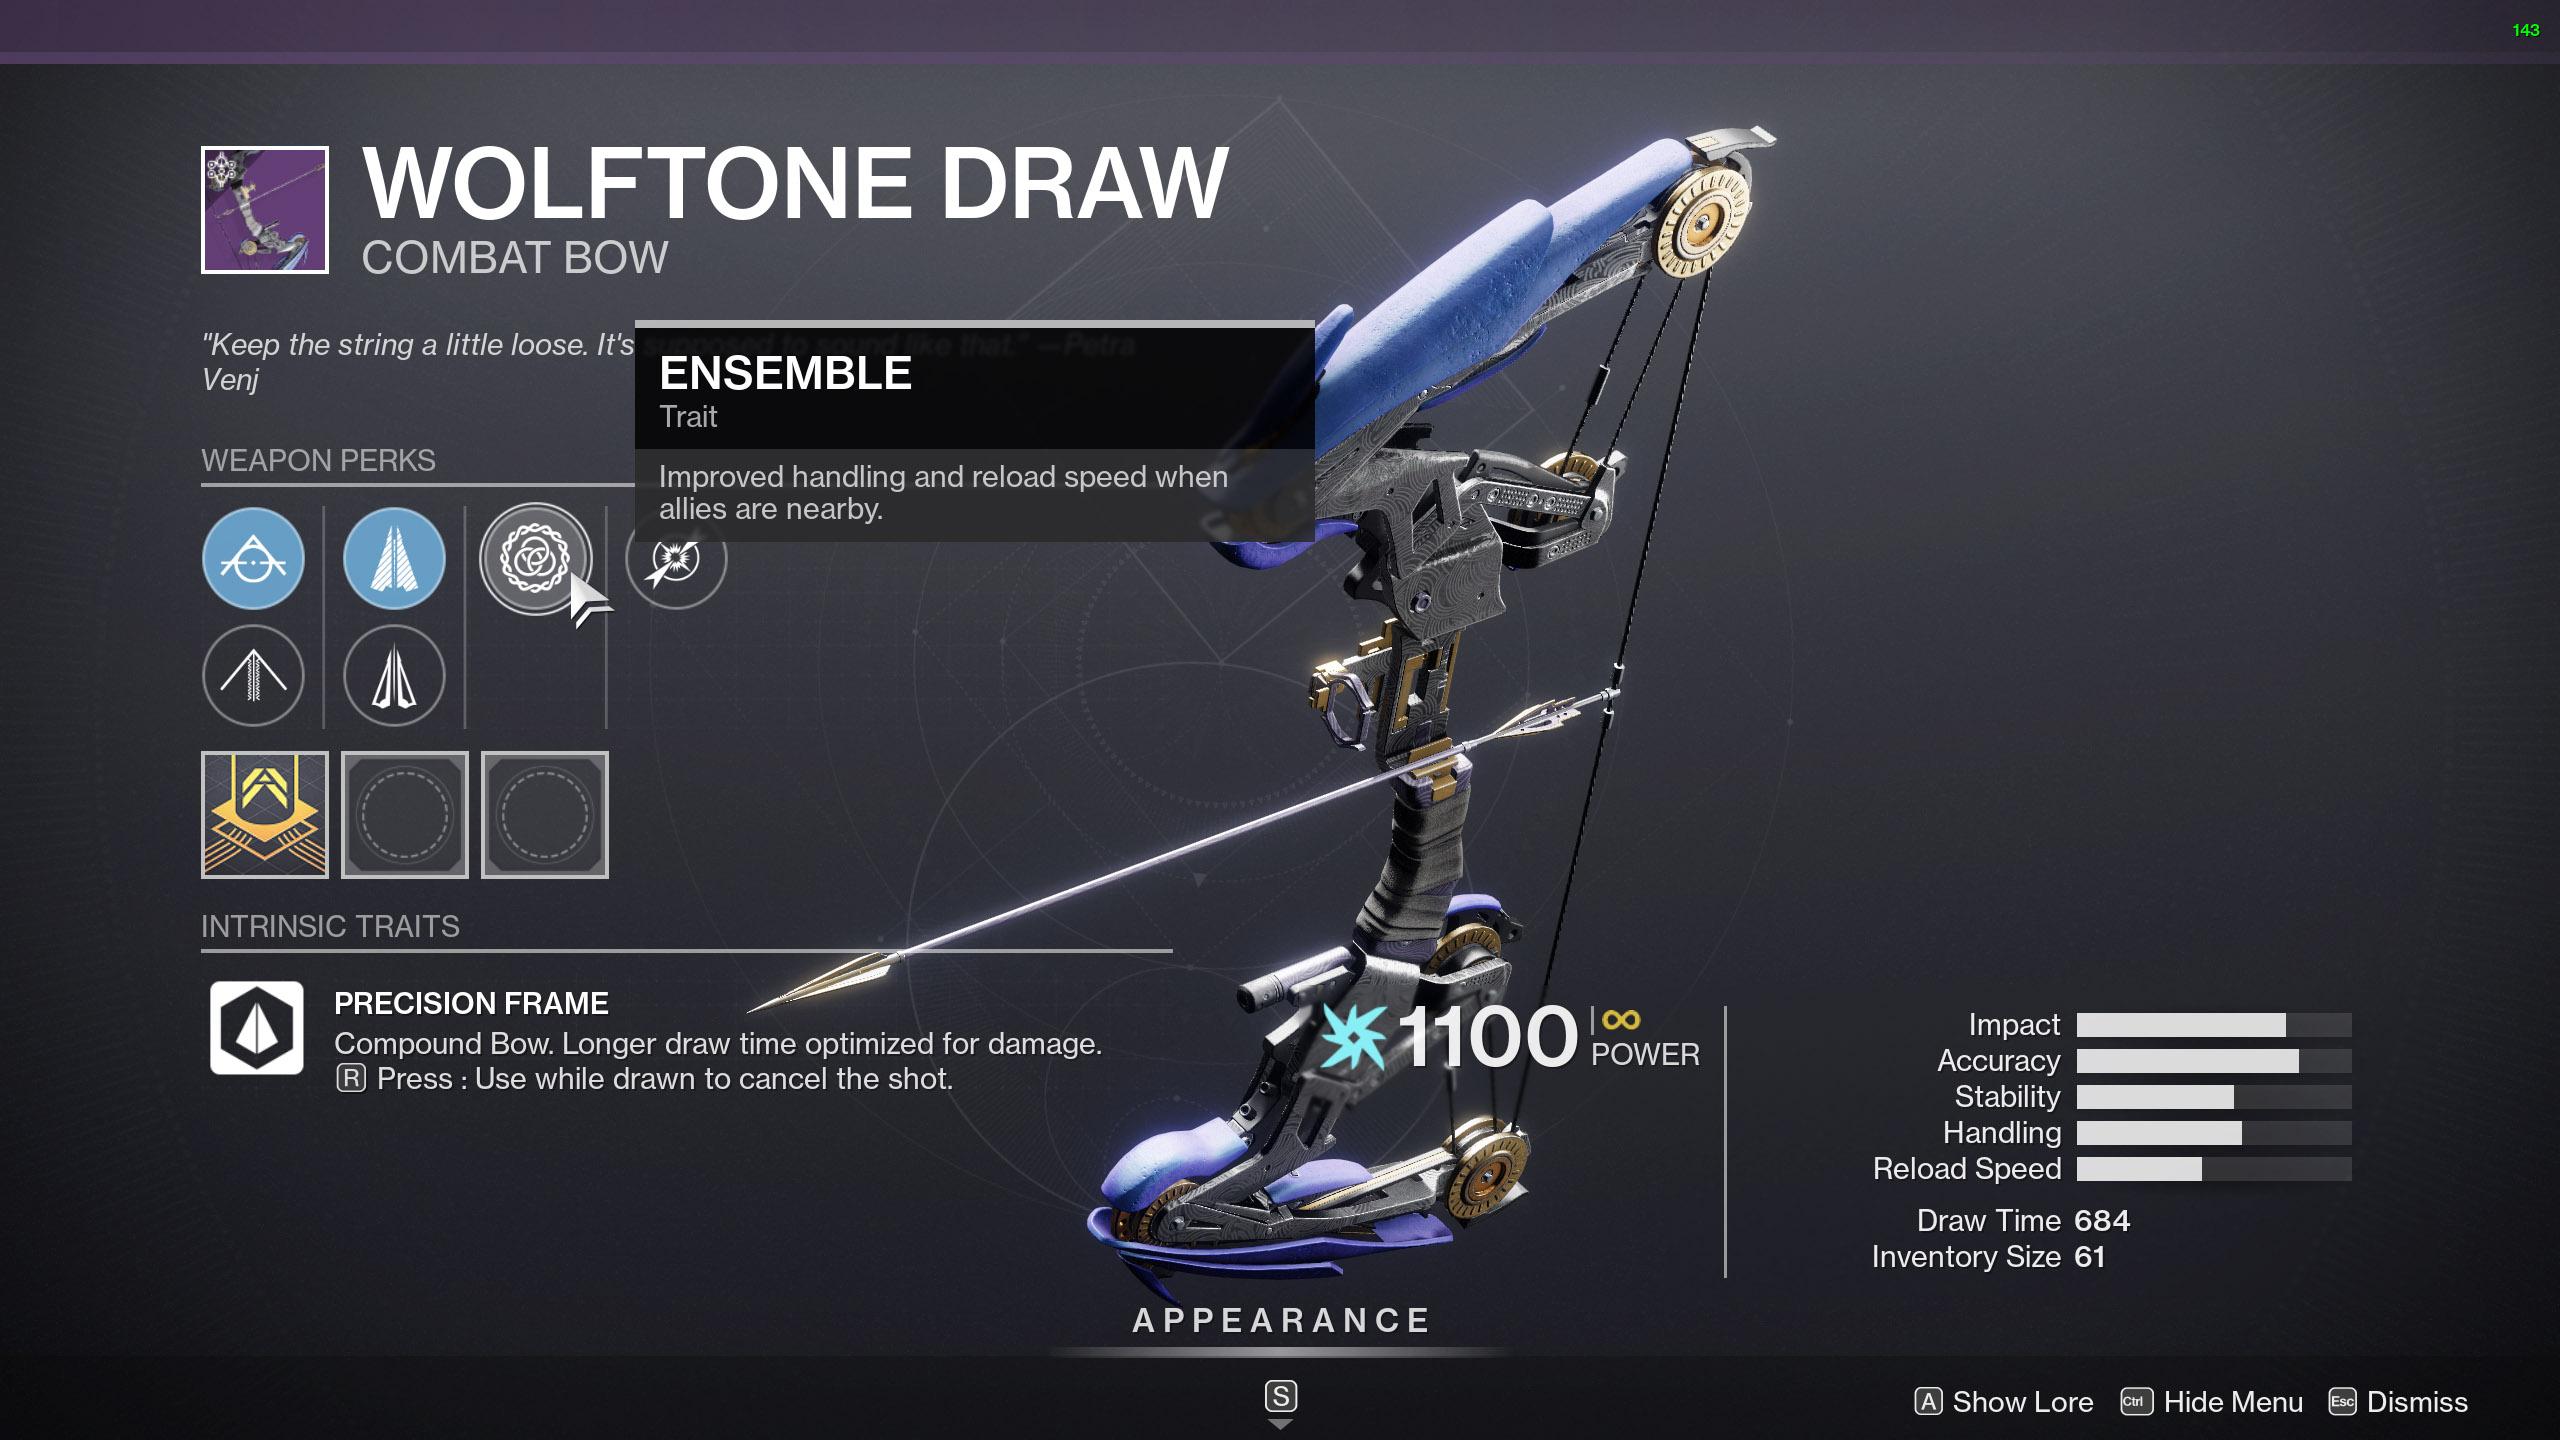 Wolftone Draw - Combat Bow